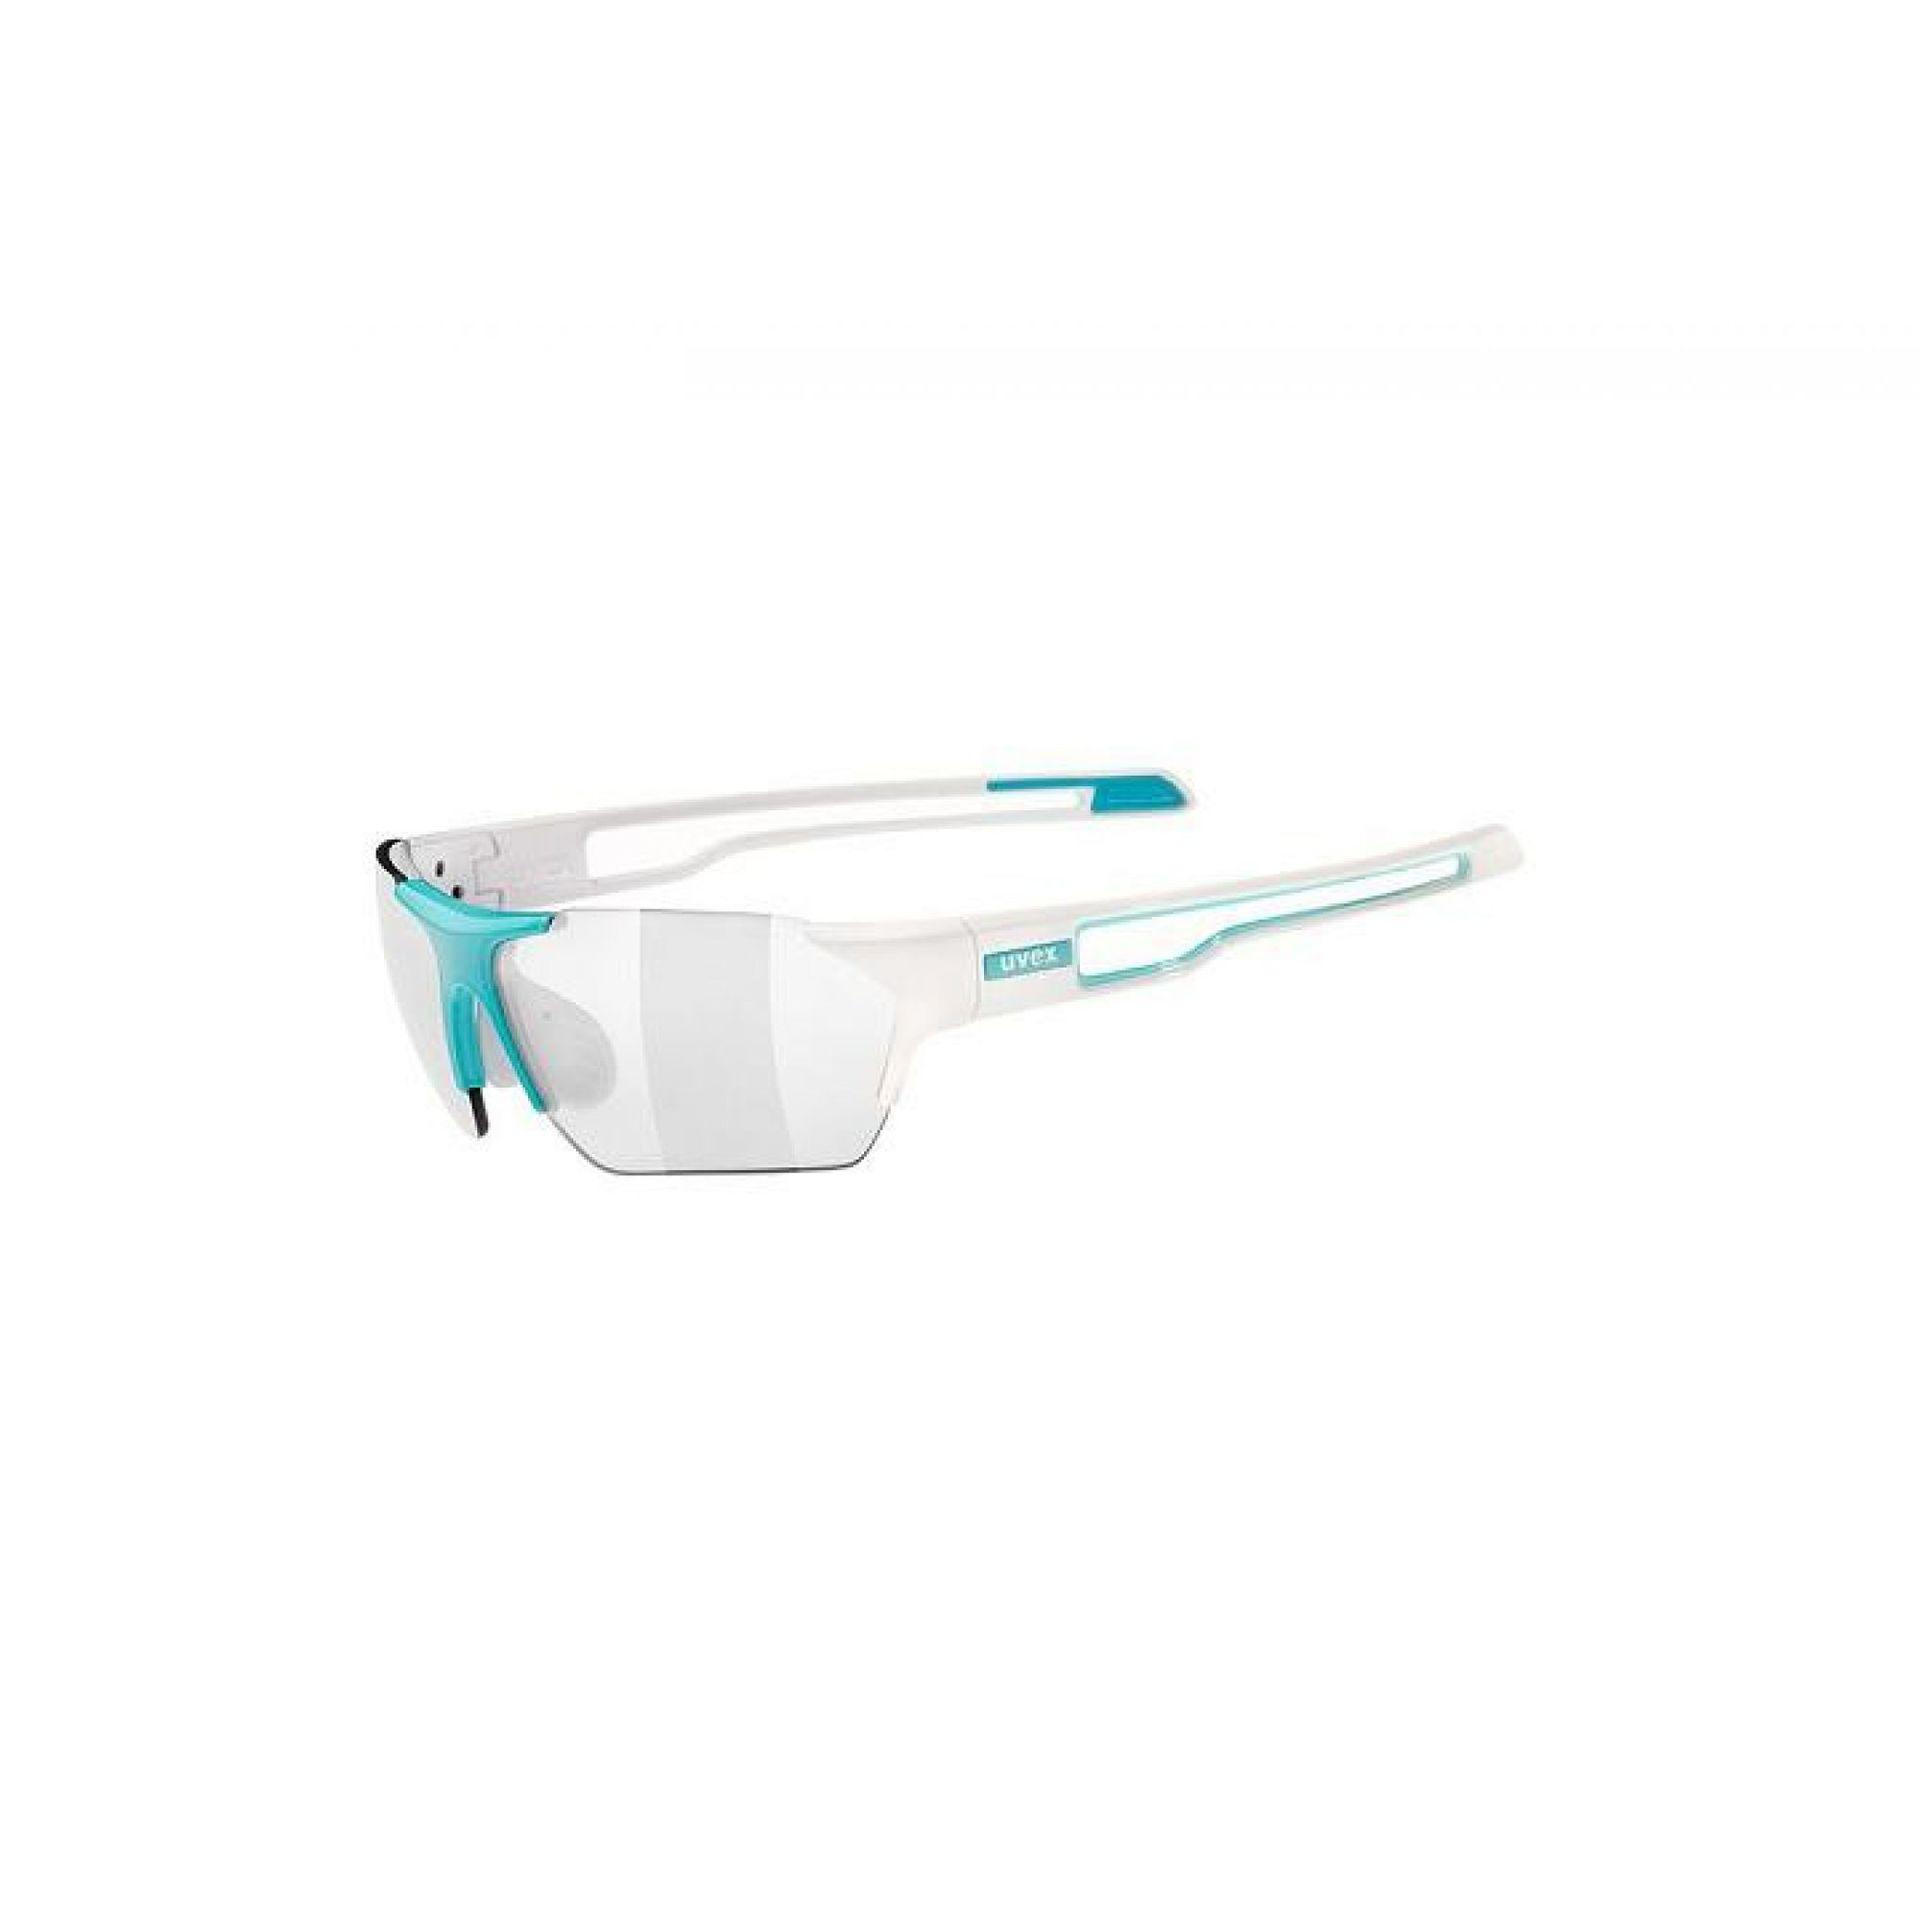 OKULARY UVEX SPORTSTYLE 202 SMALL VARIO WHITE BLUE